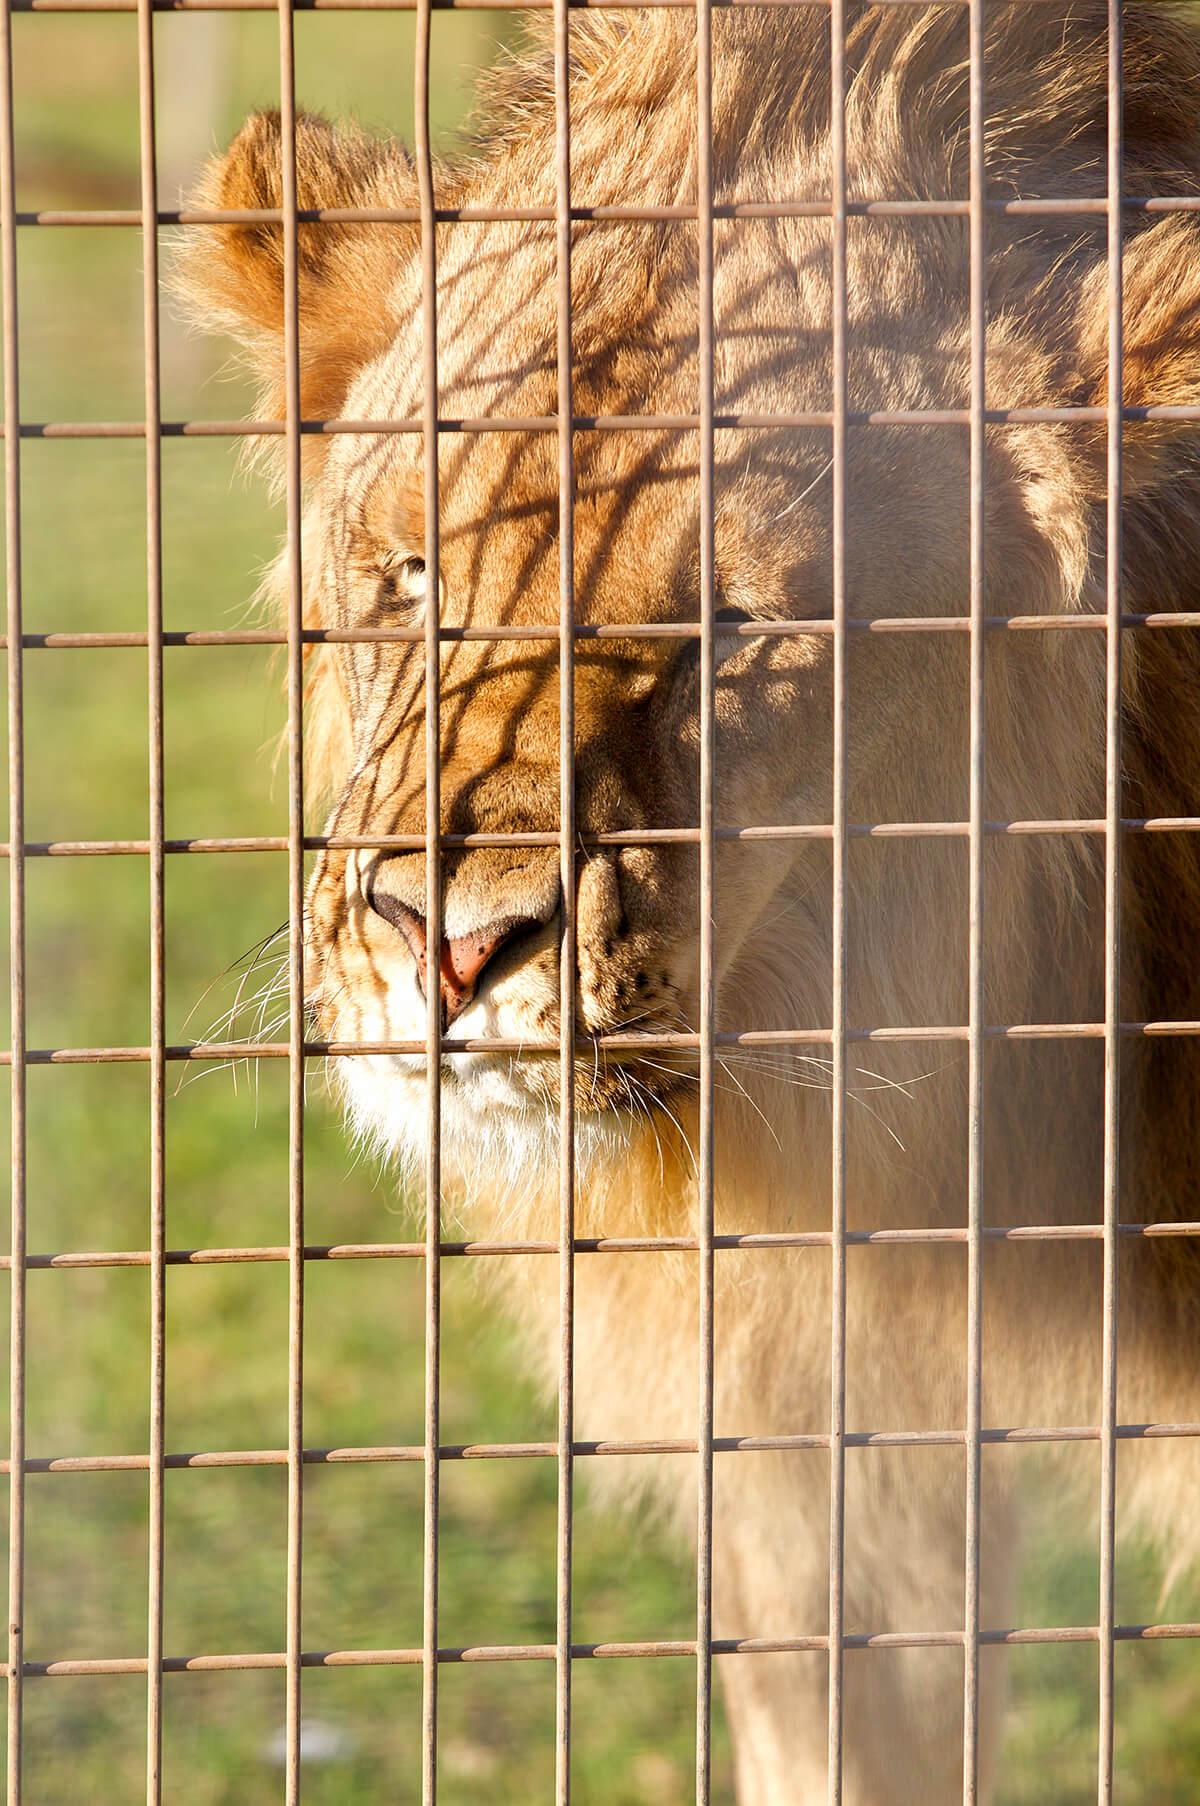 Lion at Stardust Circus, Australia